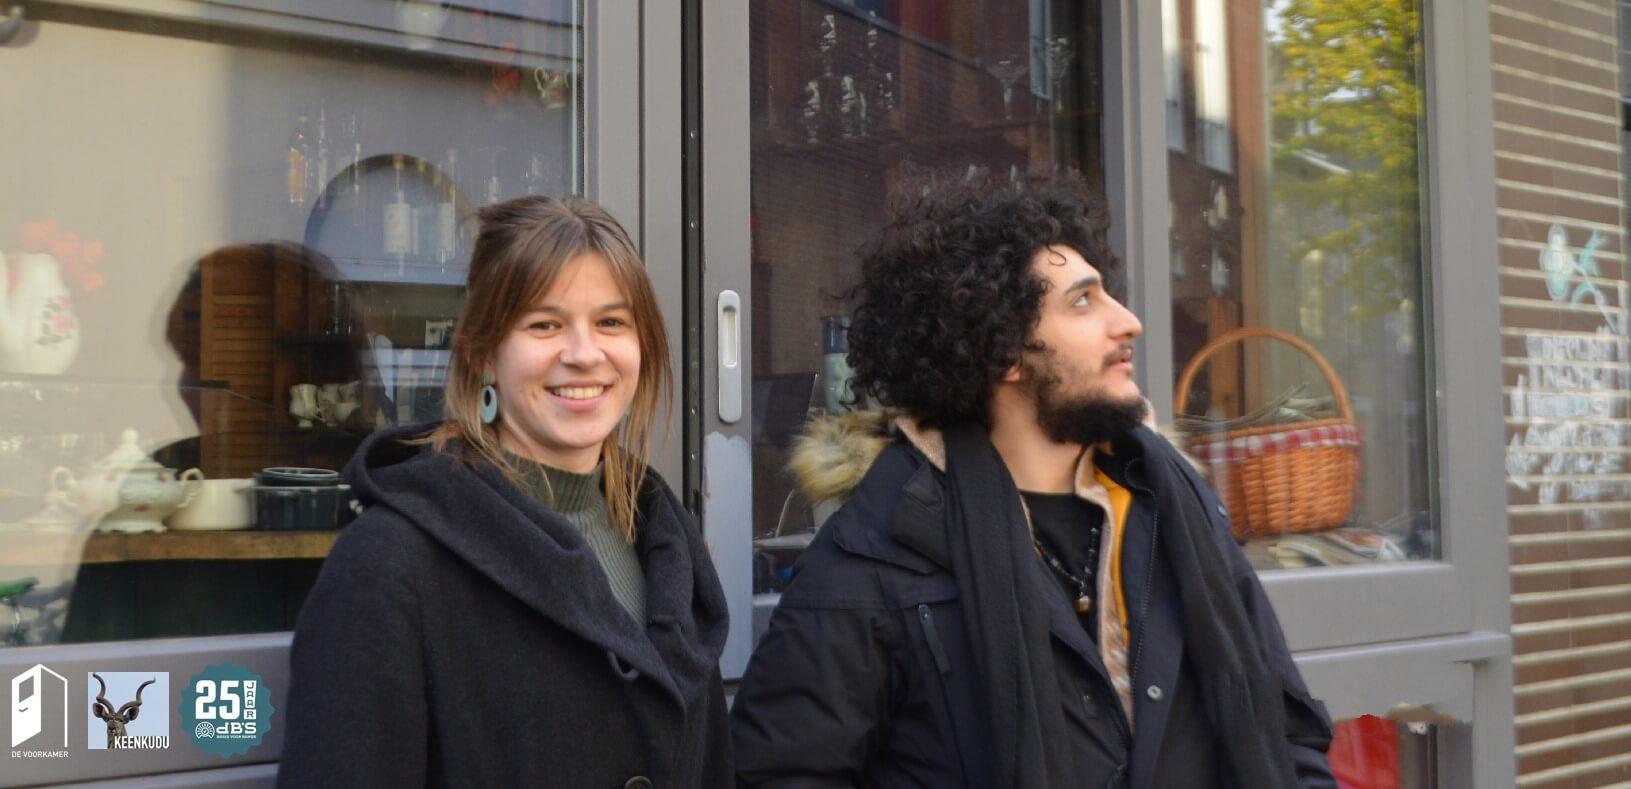 hirza Athalja & Nawras Altaky